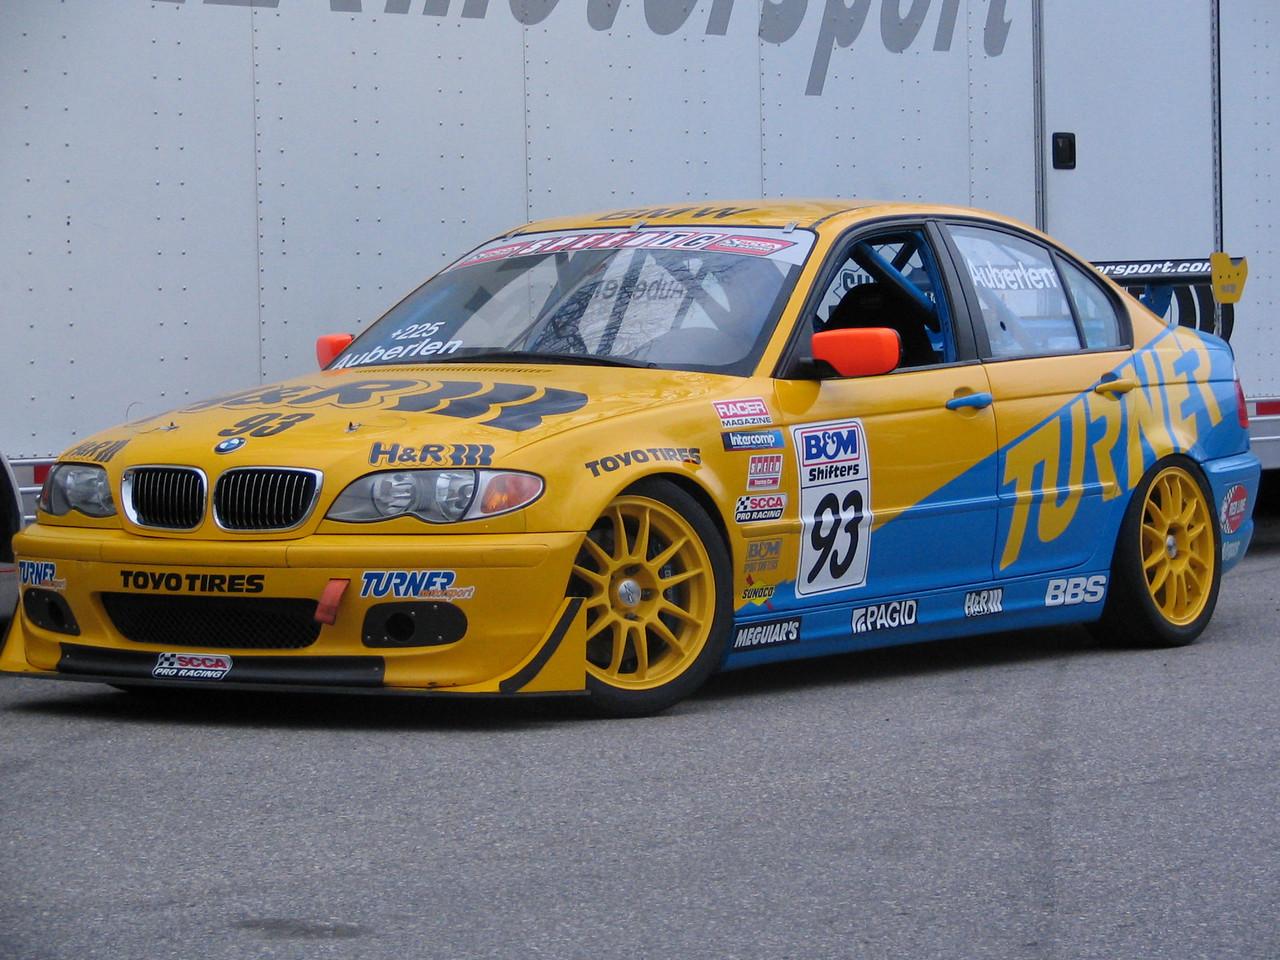 E46 325i racecar. Bill Auberlen's 2004 Touring Car Championship ride.